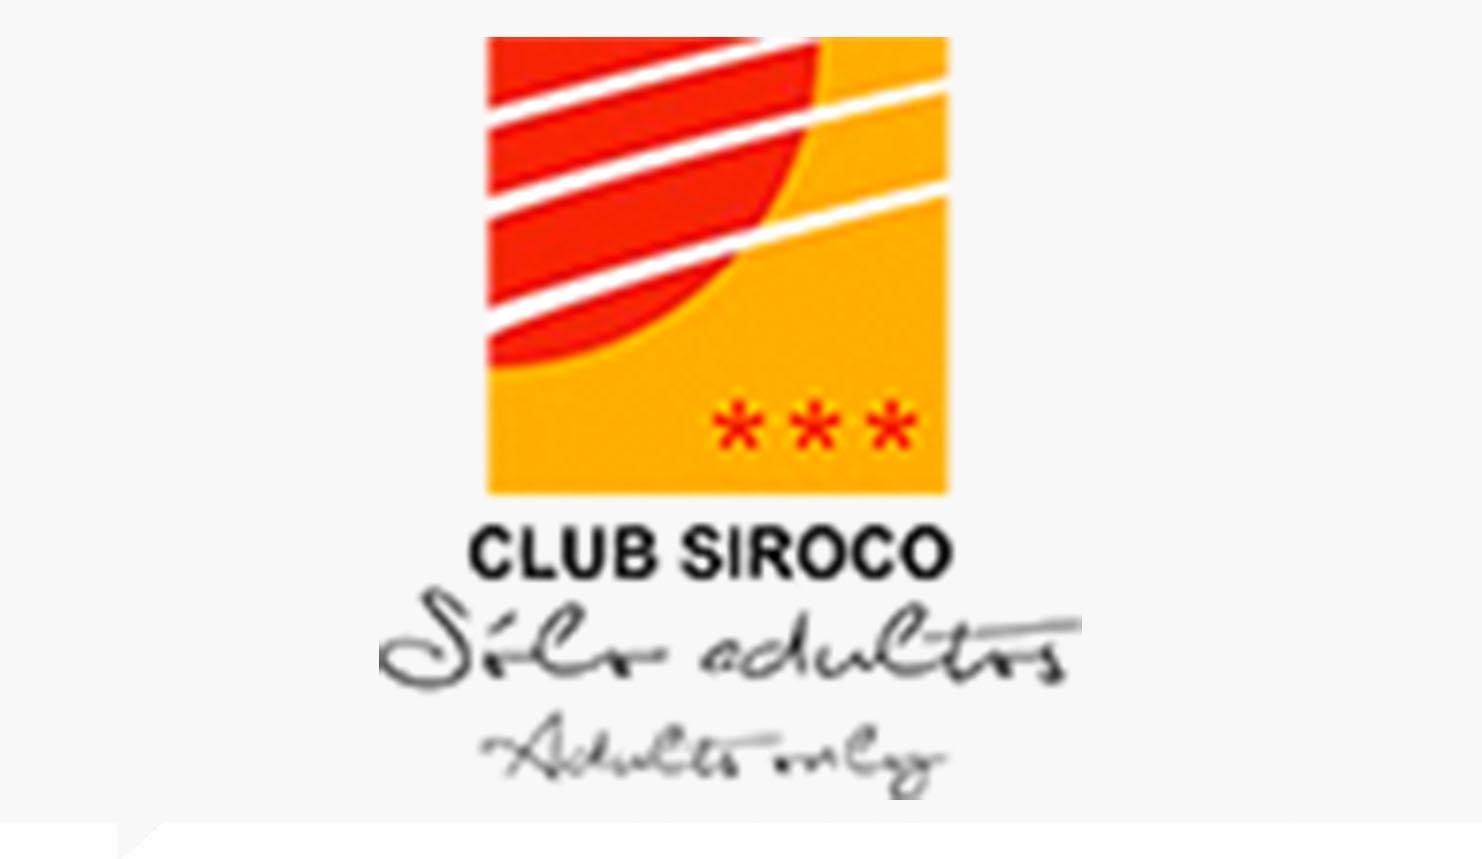 Wifi: Hotel Club Siroco (Lanzarote)